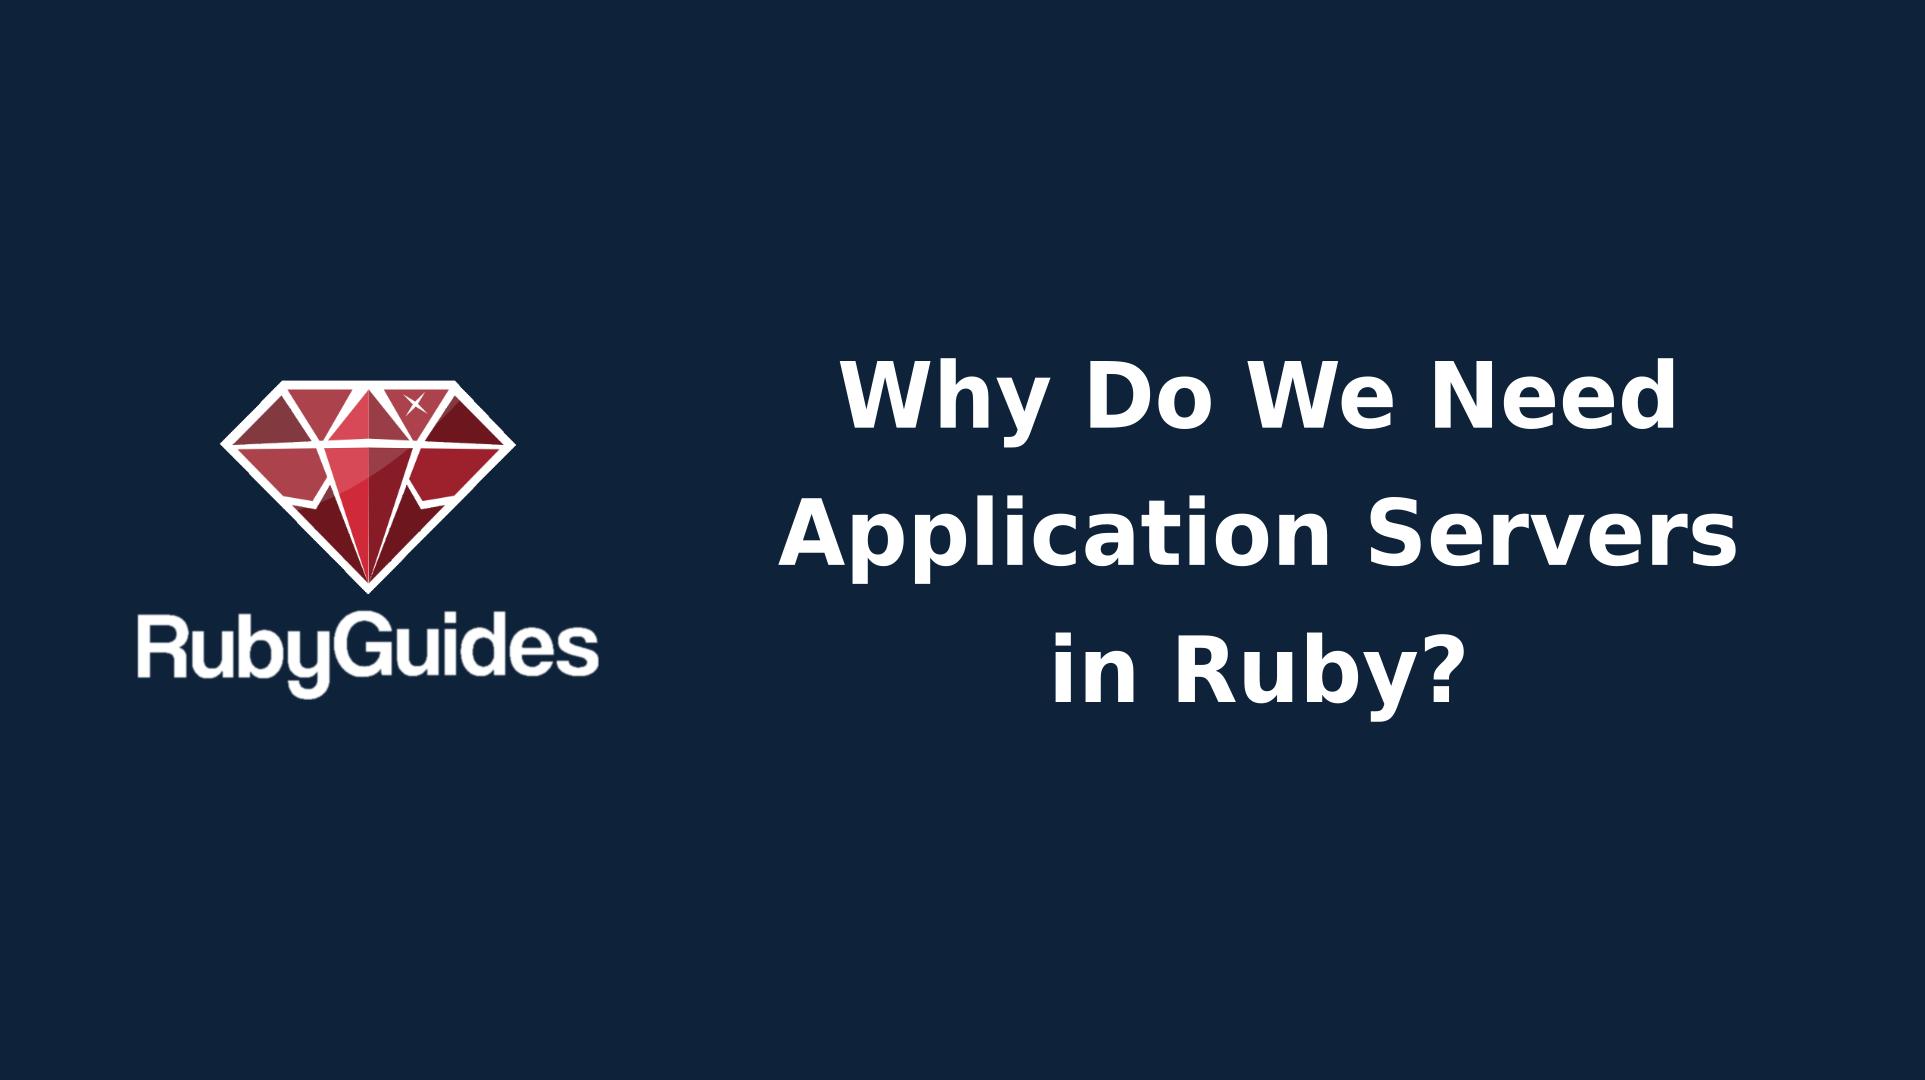 Why Do We Need Application Servers in Ruby? (Like Puma)